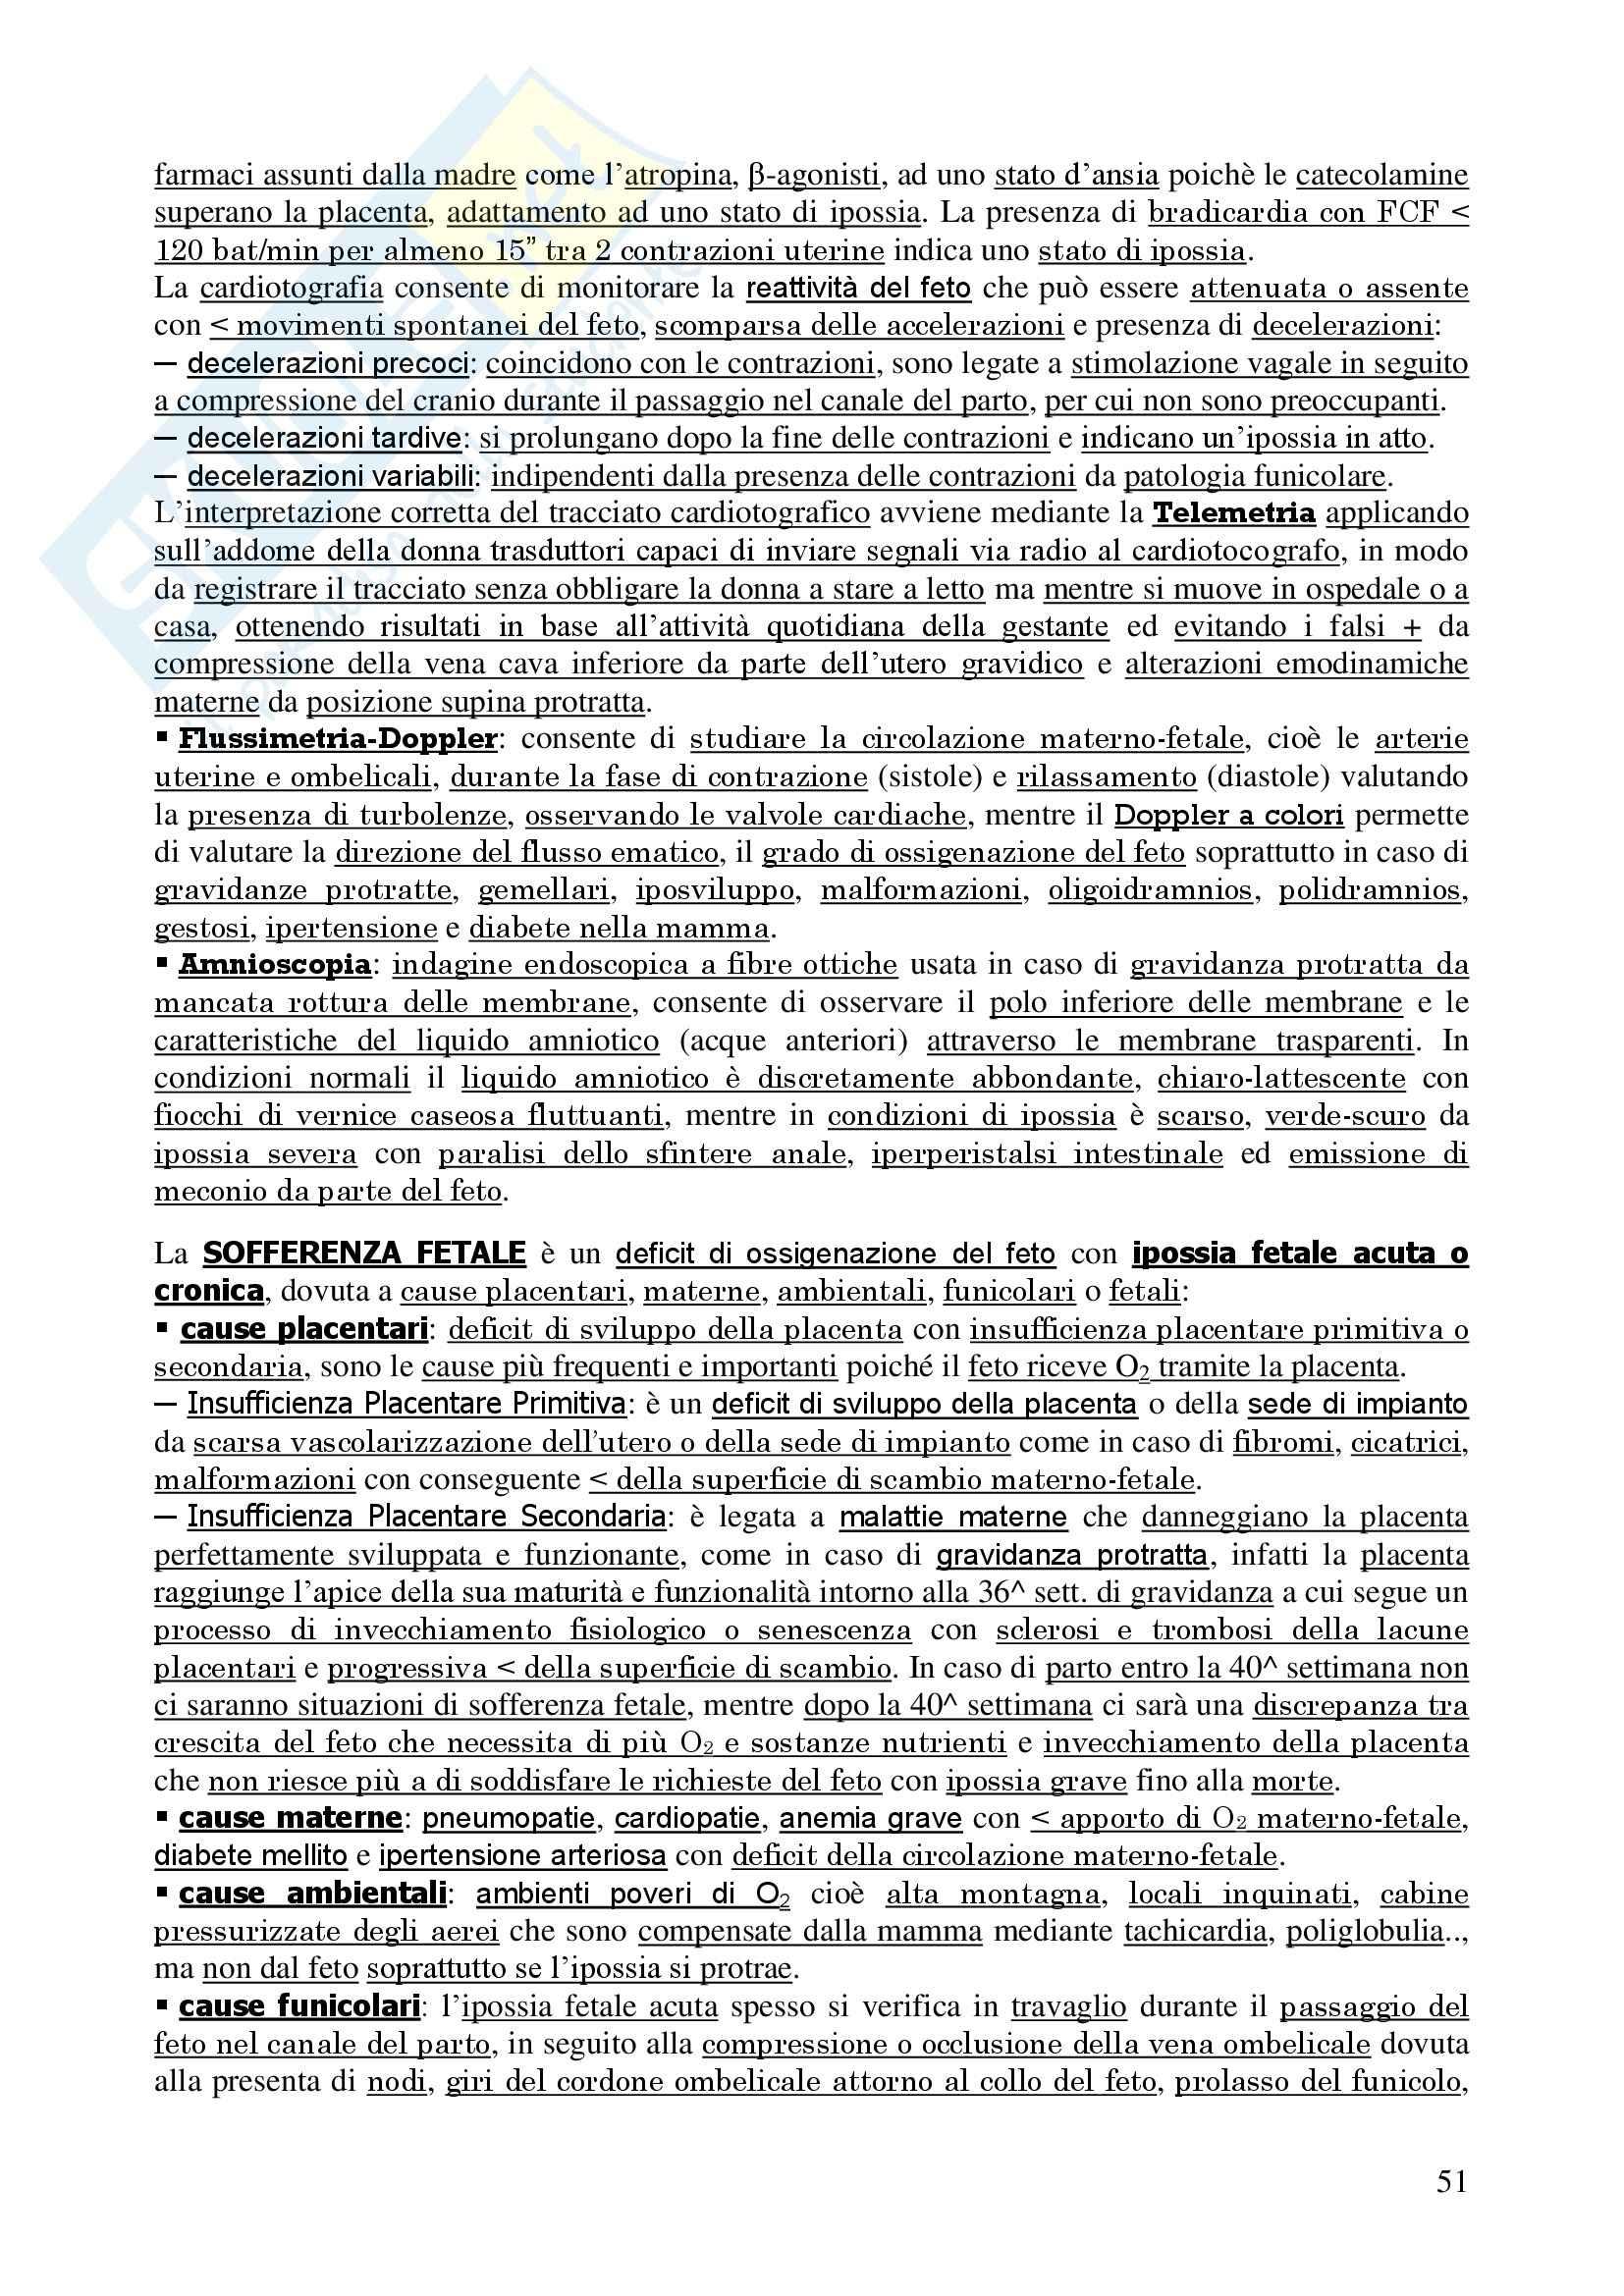 Ginecologia e Ostetricia - Appunti Pag. 51